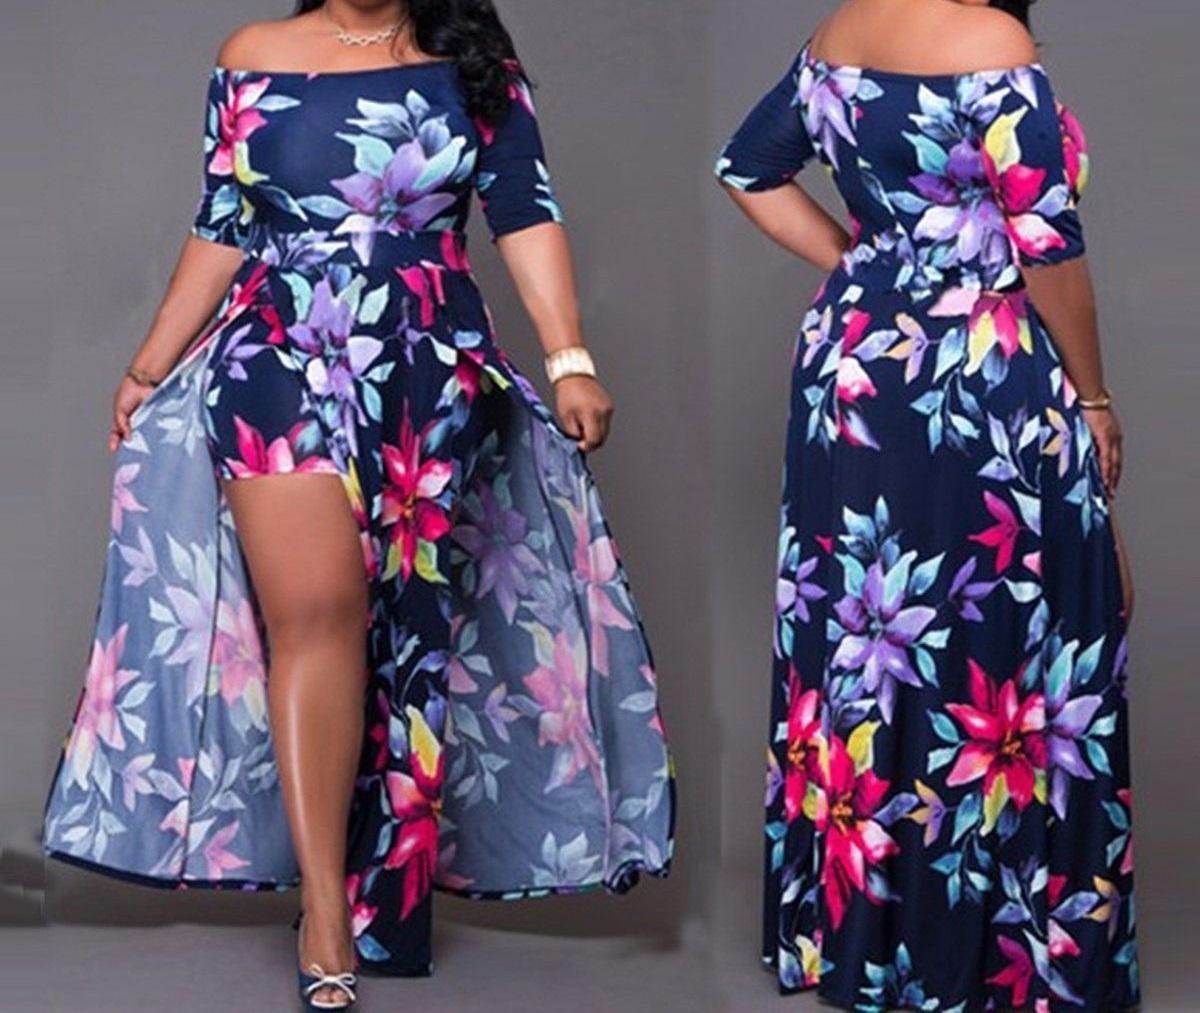 Ladies Womens Regular & PLUS SIZE Casual Evening Wear Short Sleeve Floral 3  Piece Look Top Mini Shorts Maxi Dress